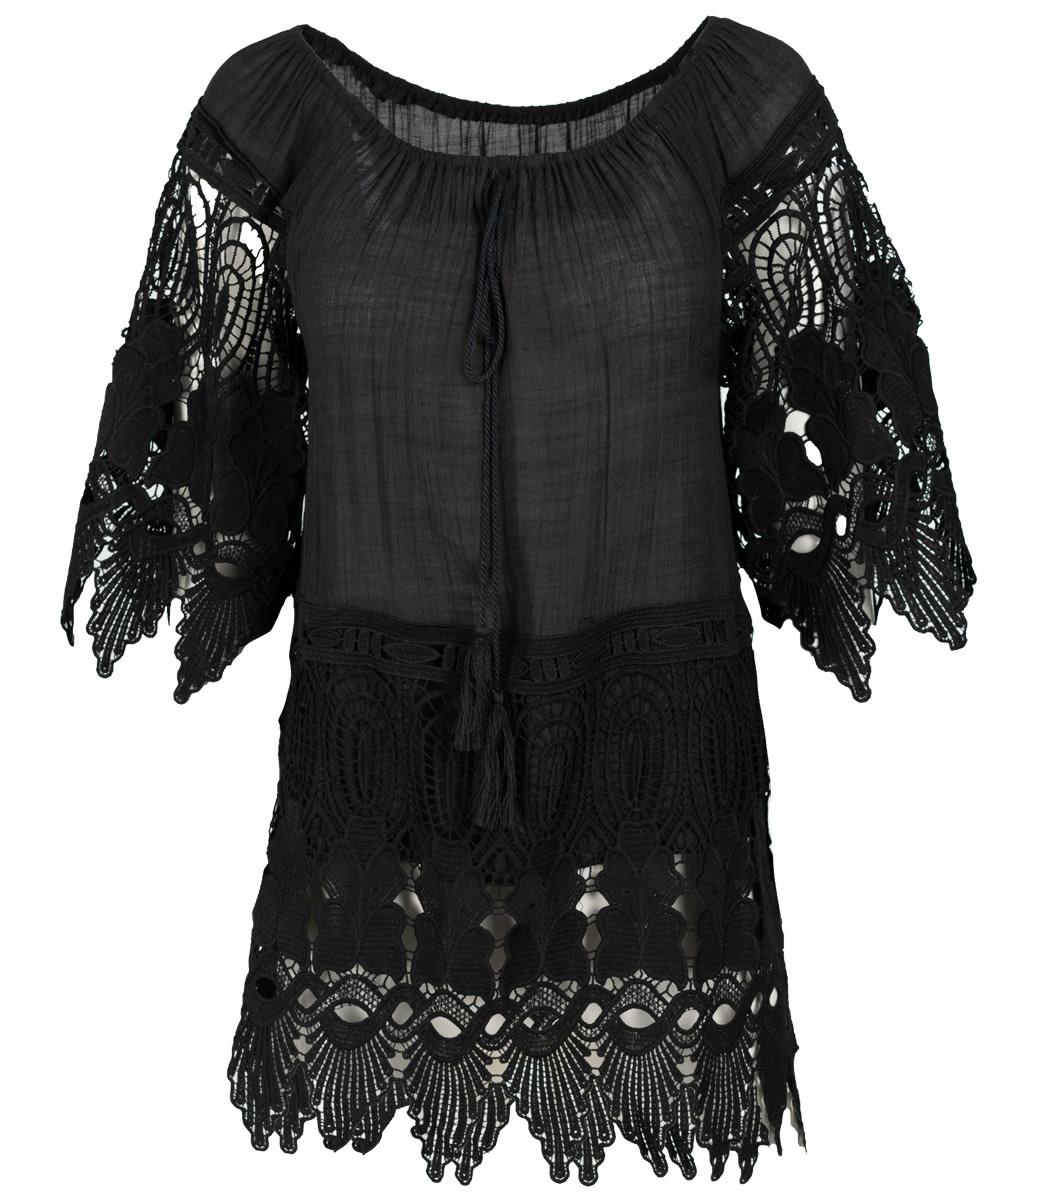 Wannahavesfashion Shirt zwart kant Trudy